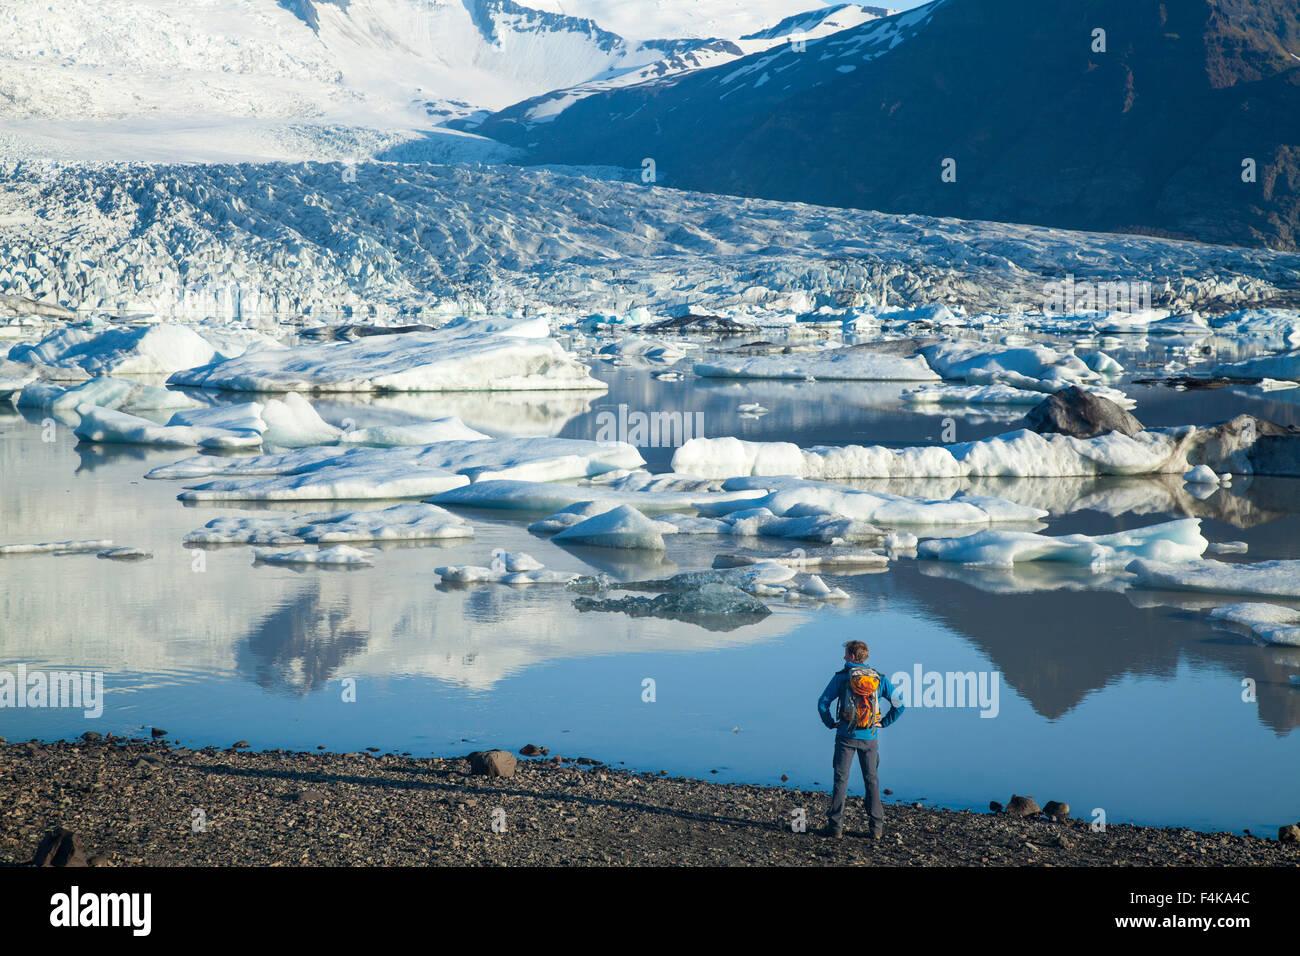 Personne à côté de Fjallsarlon lagoon iceberg, sous le glacier Fjallsjokull. Parc national du Vatnajökull, Photo Stock